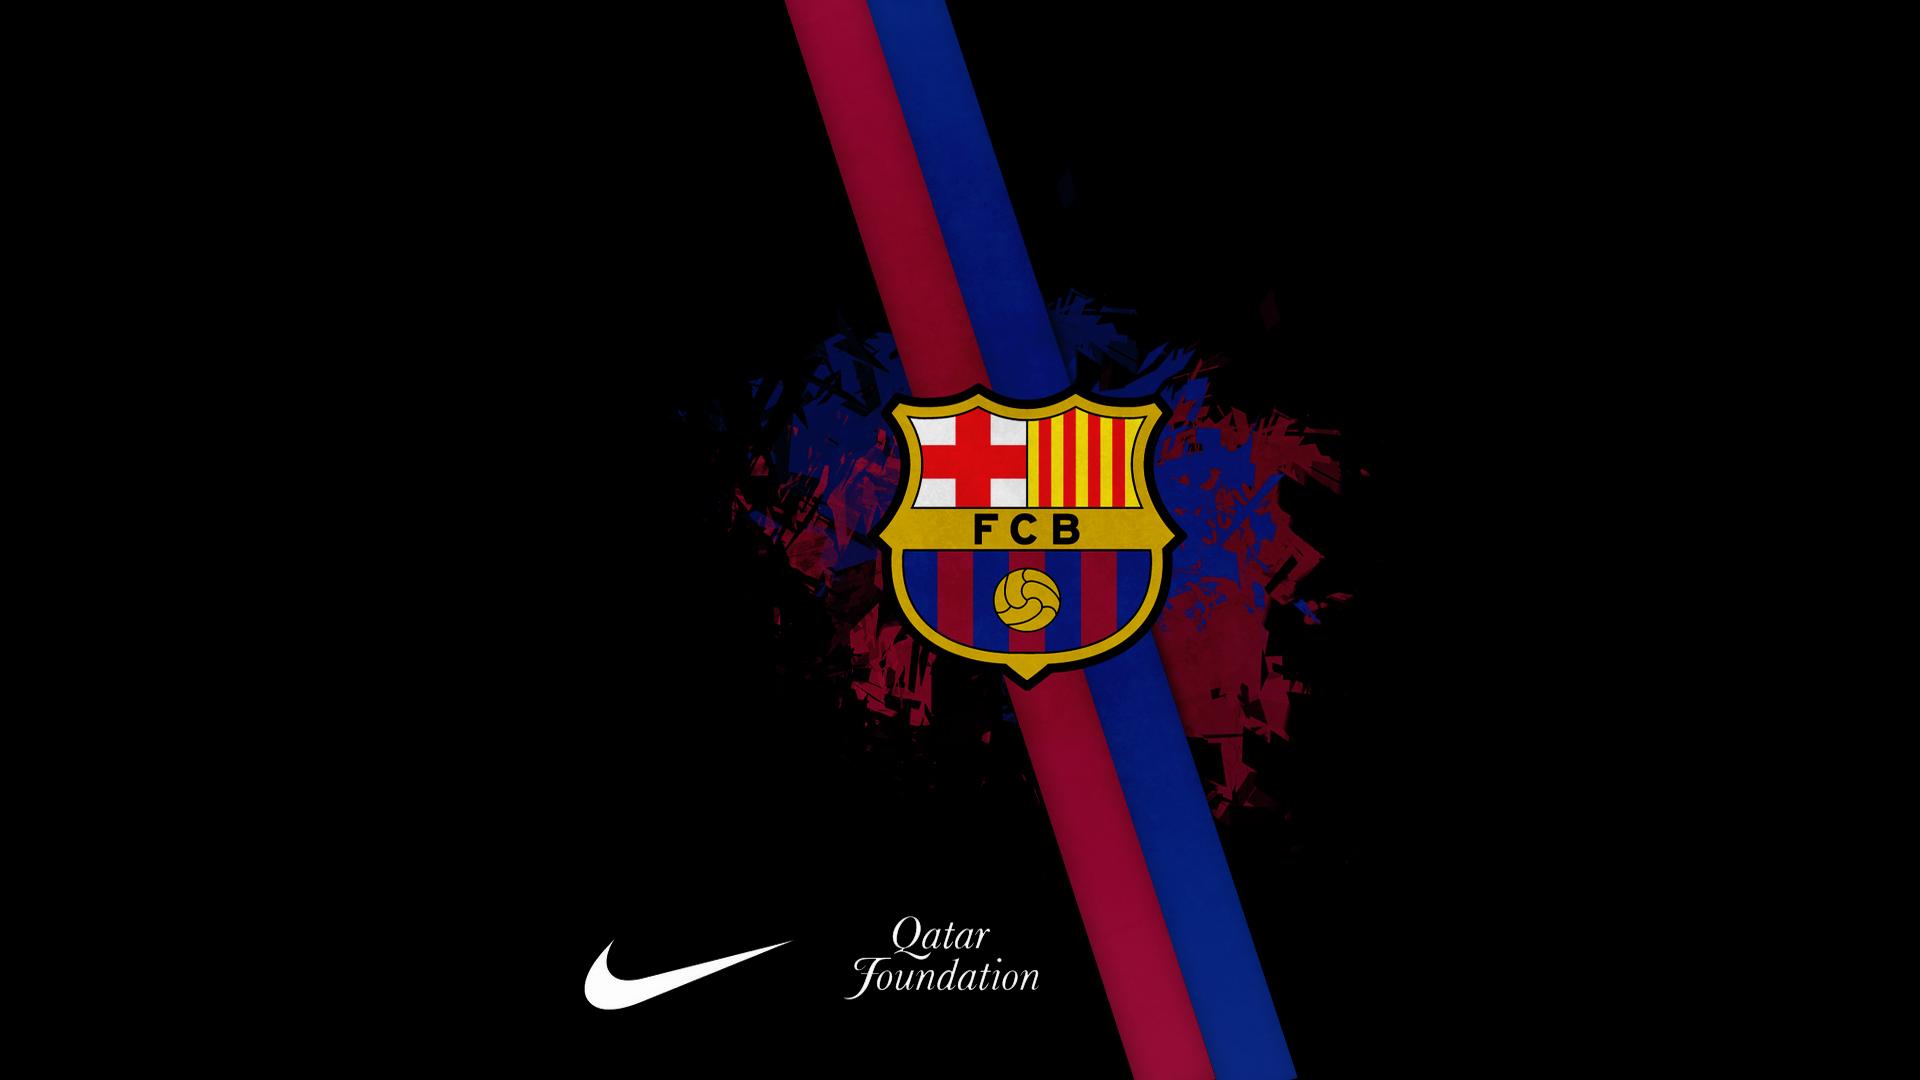 Barcelona FC Wallpaper 1920x1080